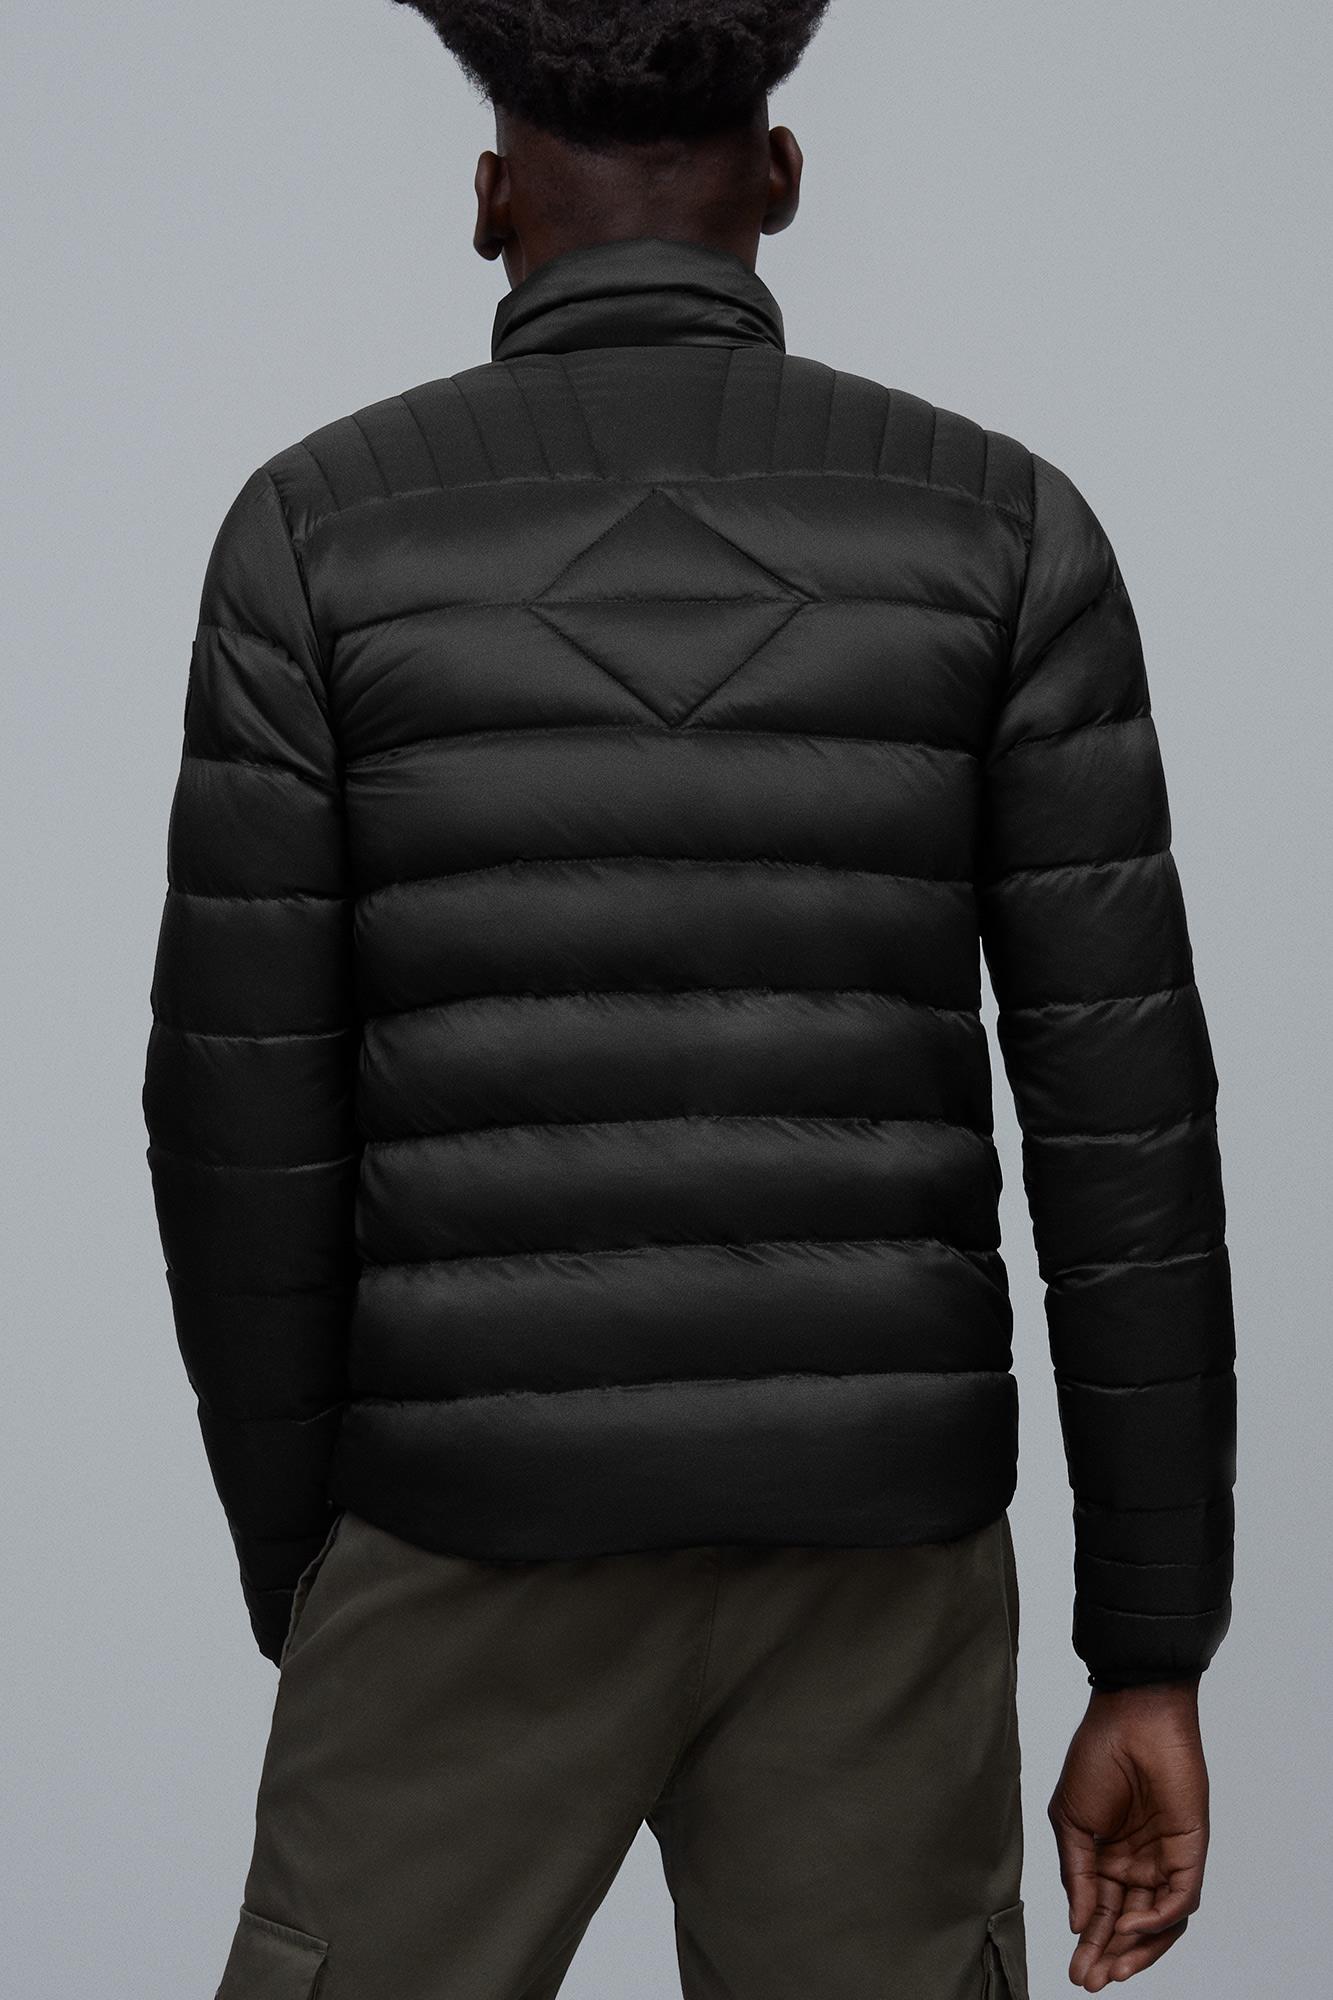 a436a8eaddf96 Brookvale Jacket Black Label | Men | Canada Goose®